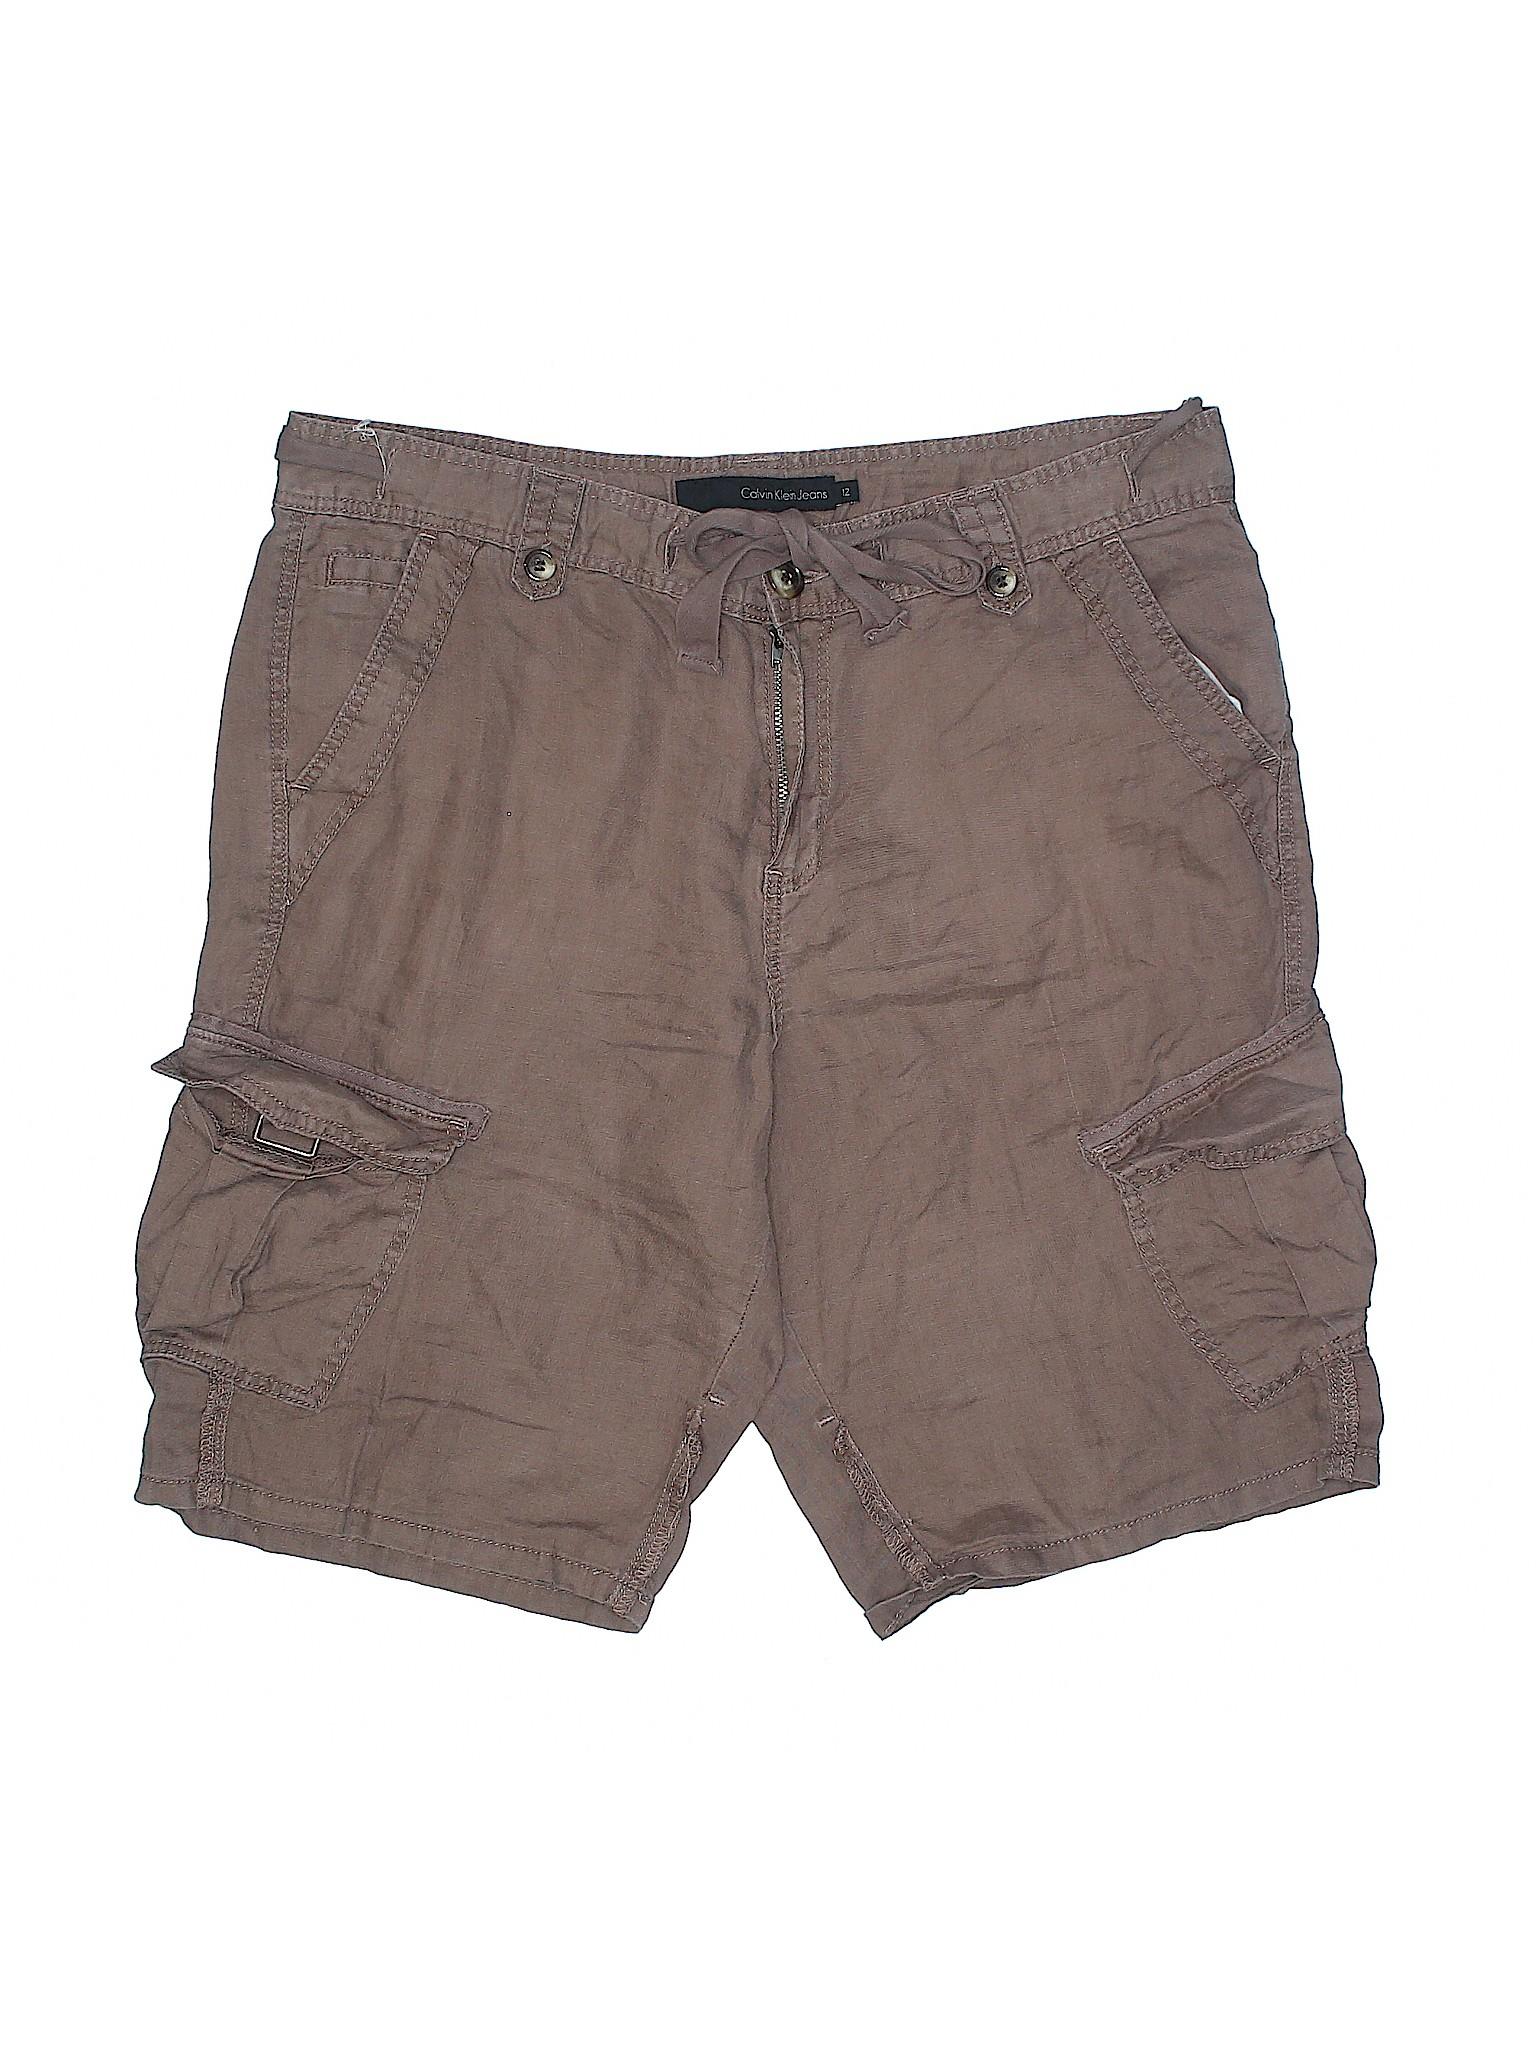 Shorts Cargo Boutique KLEIN CALVIN JEANS wYqBX18